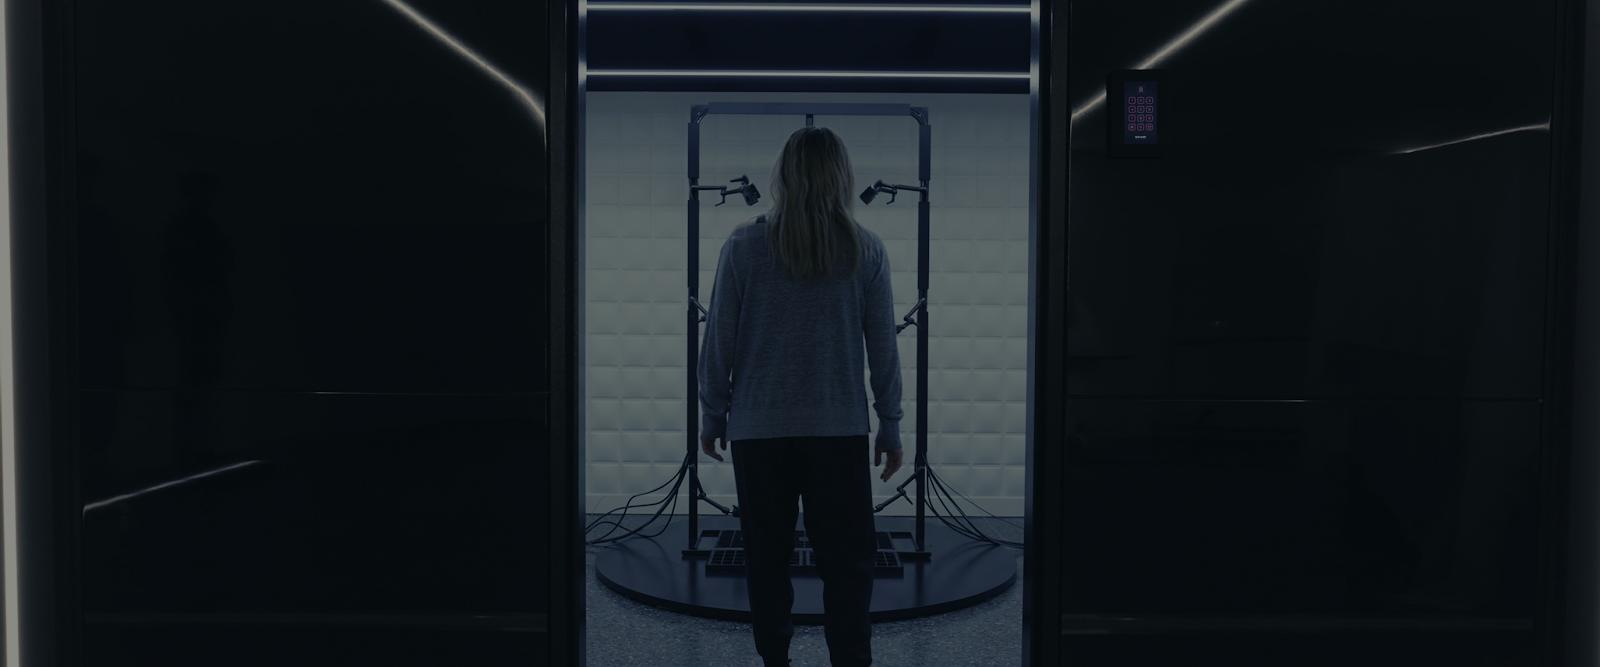 El Hombre Invisible (2020) 4K UHD HDR Latino